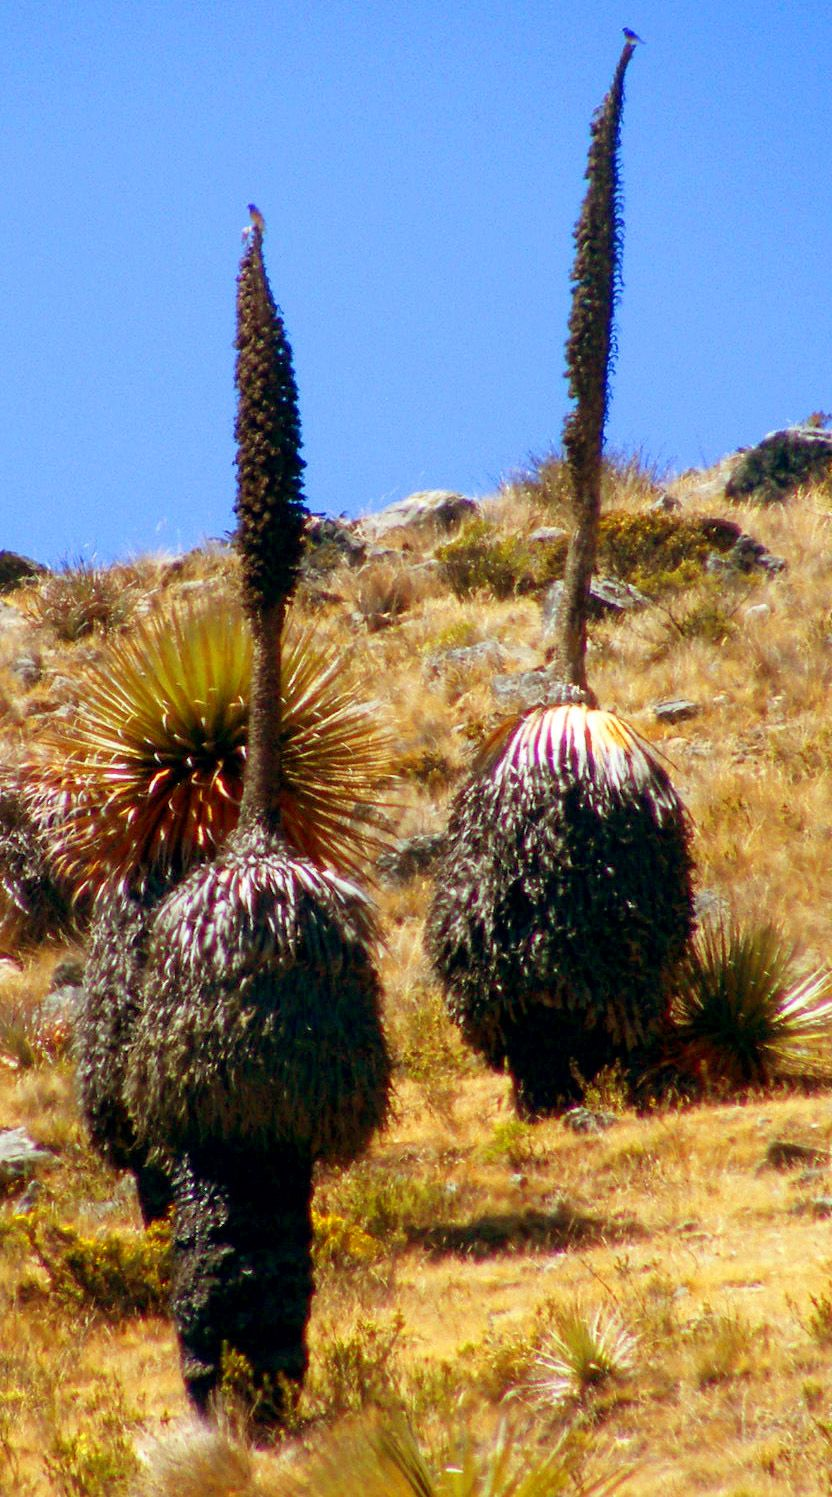 KDS Photo, Puya raimondi dead after flowering, Peru